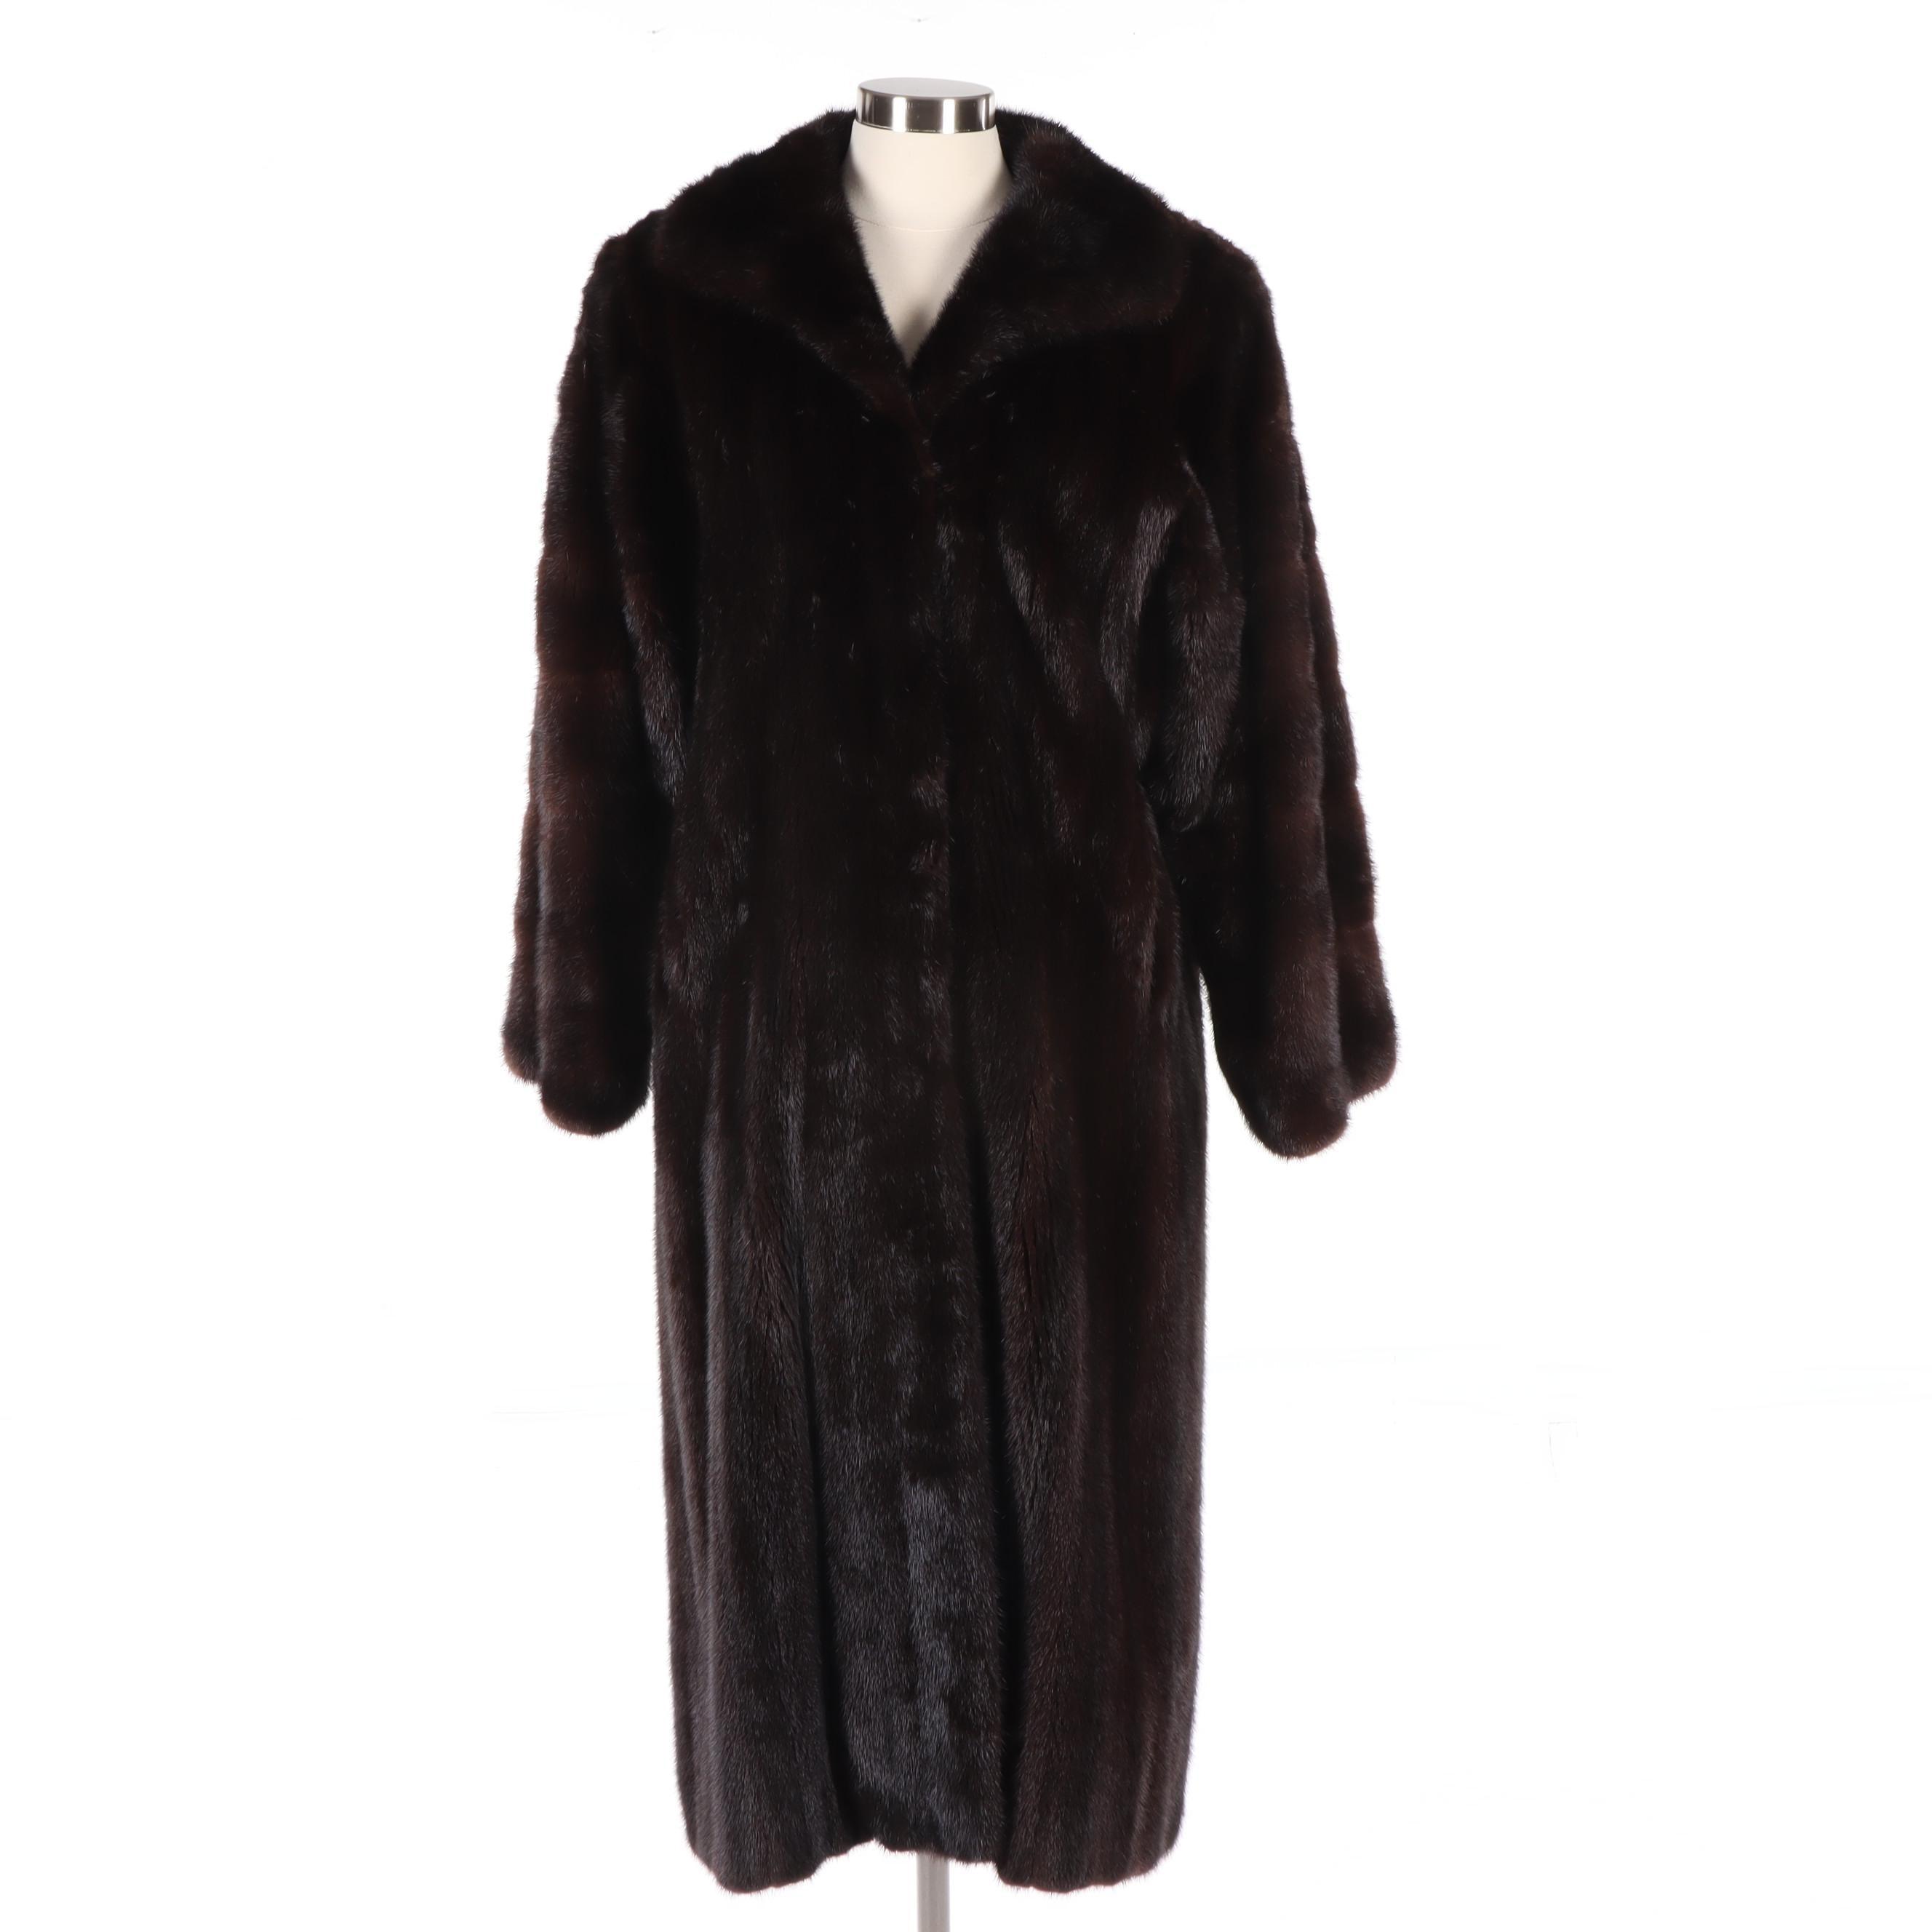 Women's Dark Mahogany Mink Fur Coat, Vintage